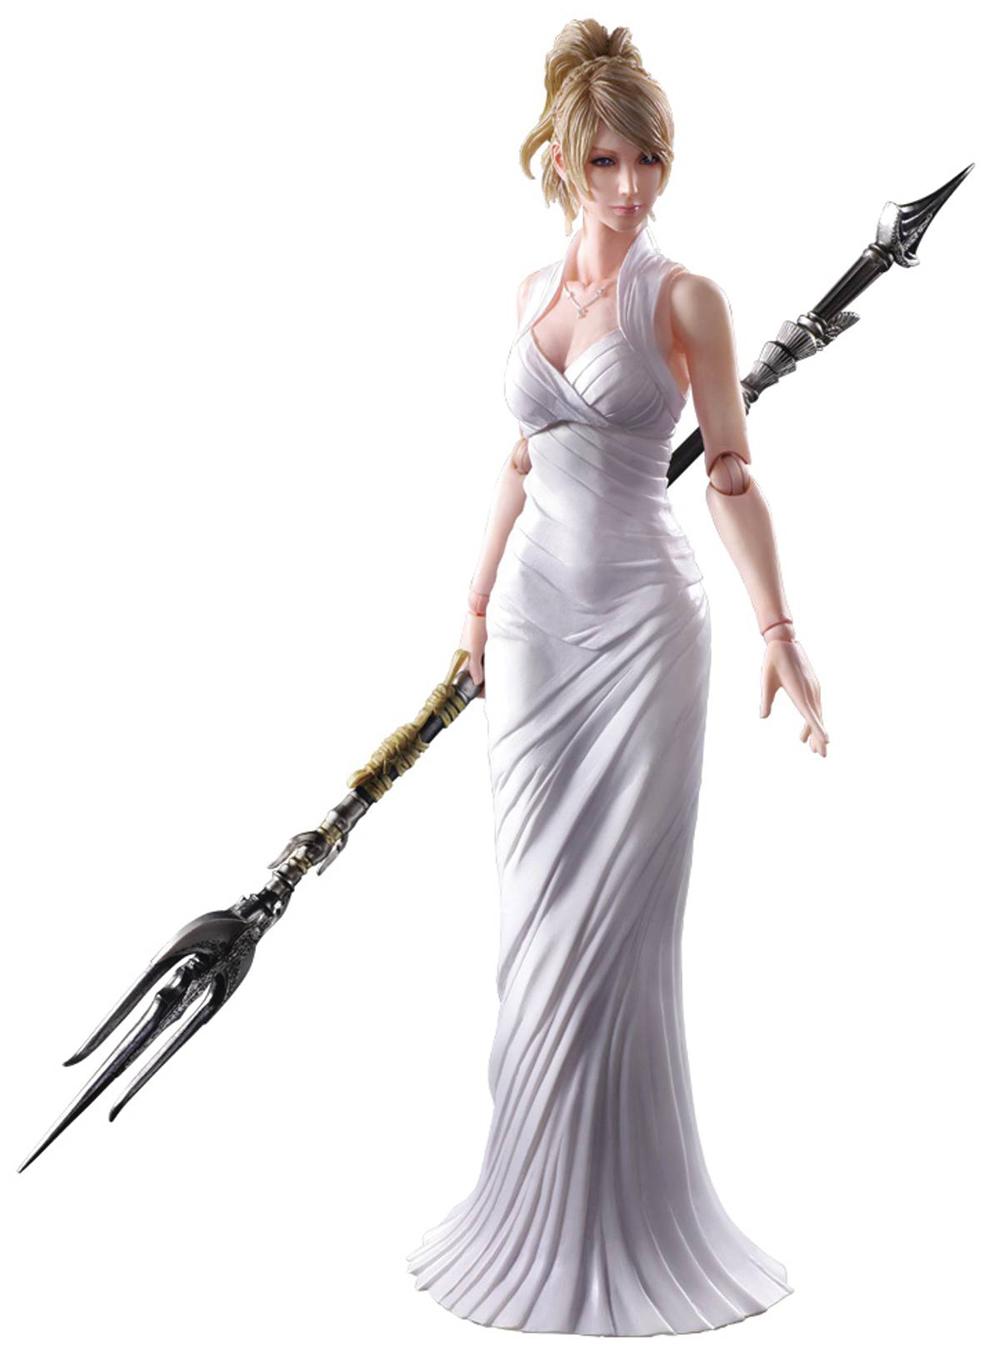 Final Fantasy XV Play Arts Kai Lunafreya Figure